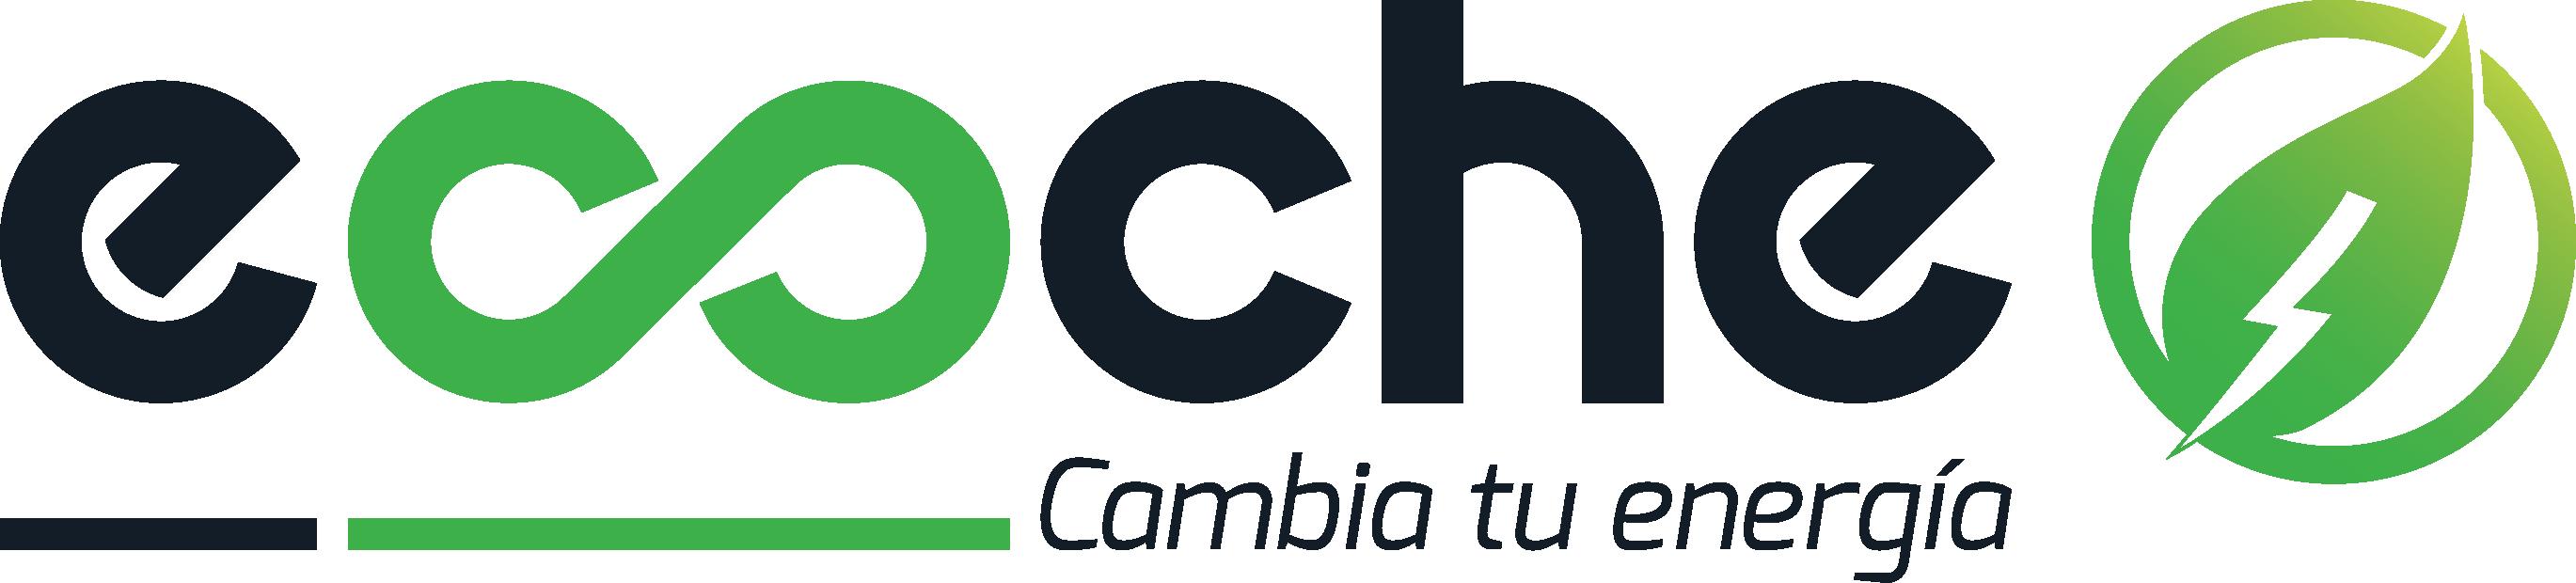 Ecoche - Conversión de vehículo de combustión interna a vehículo eléctrico